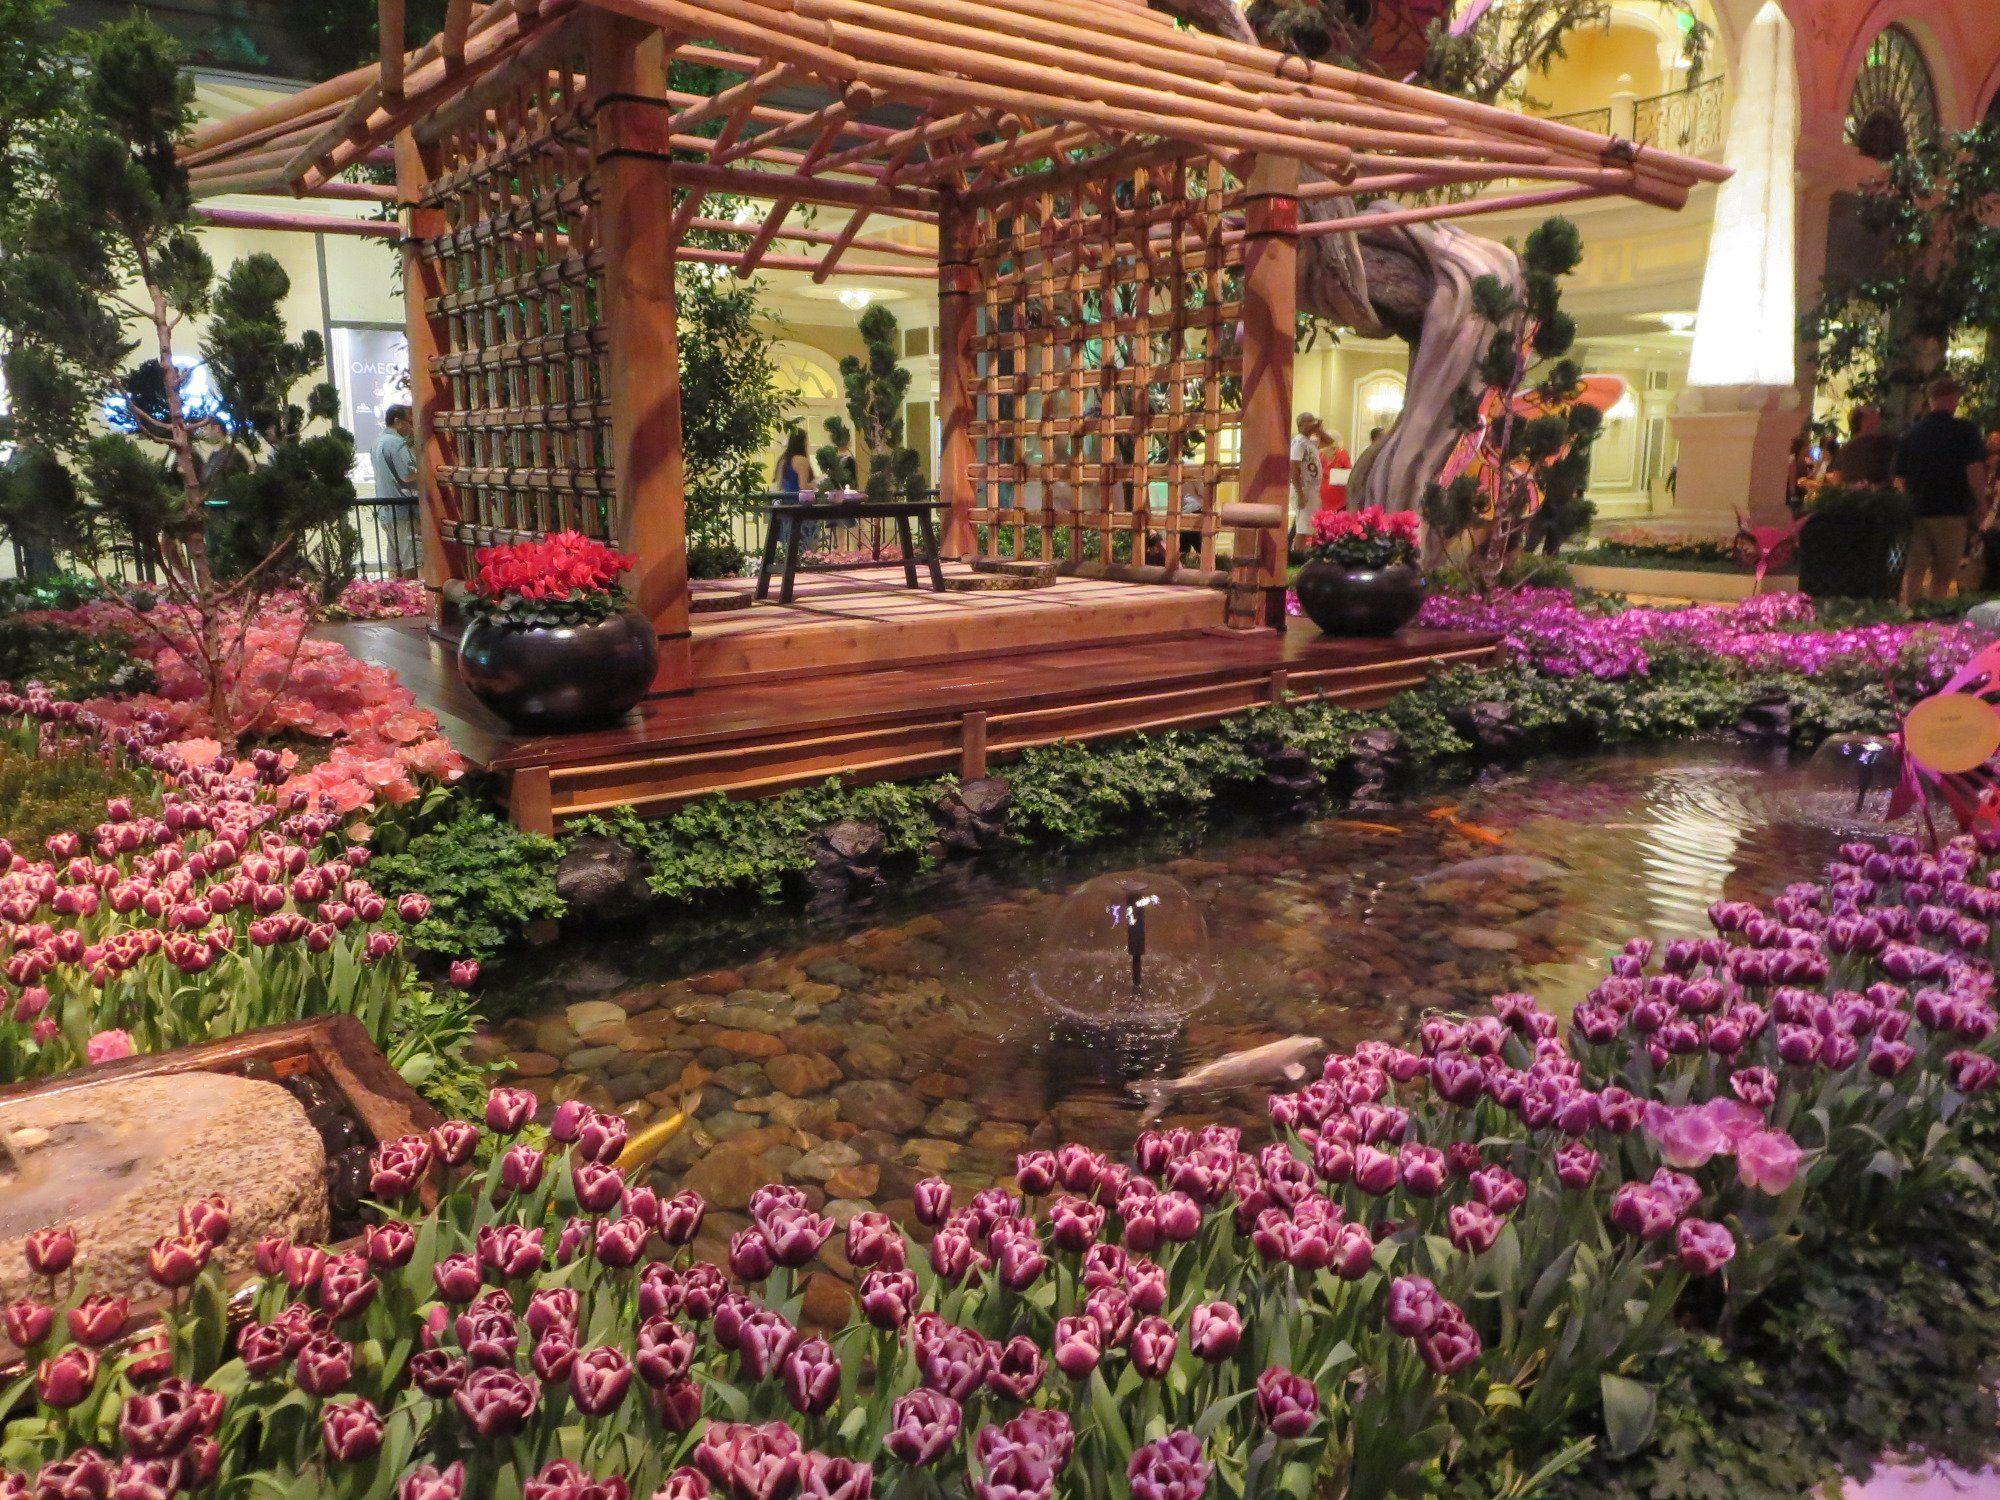 cf035bcab6dd69cbd8d9a830aaddcbb6 - Bellagio Conservatory & Botanical Gardens Las Vegas